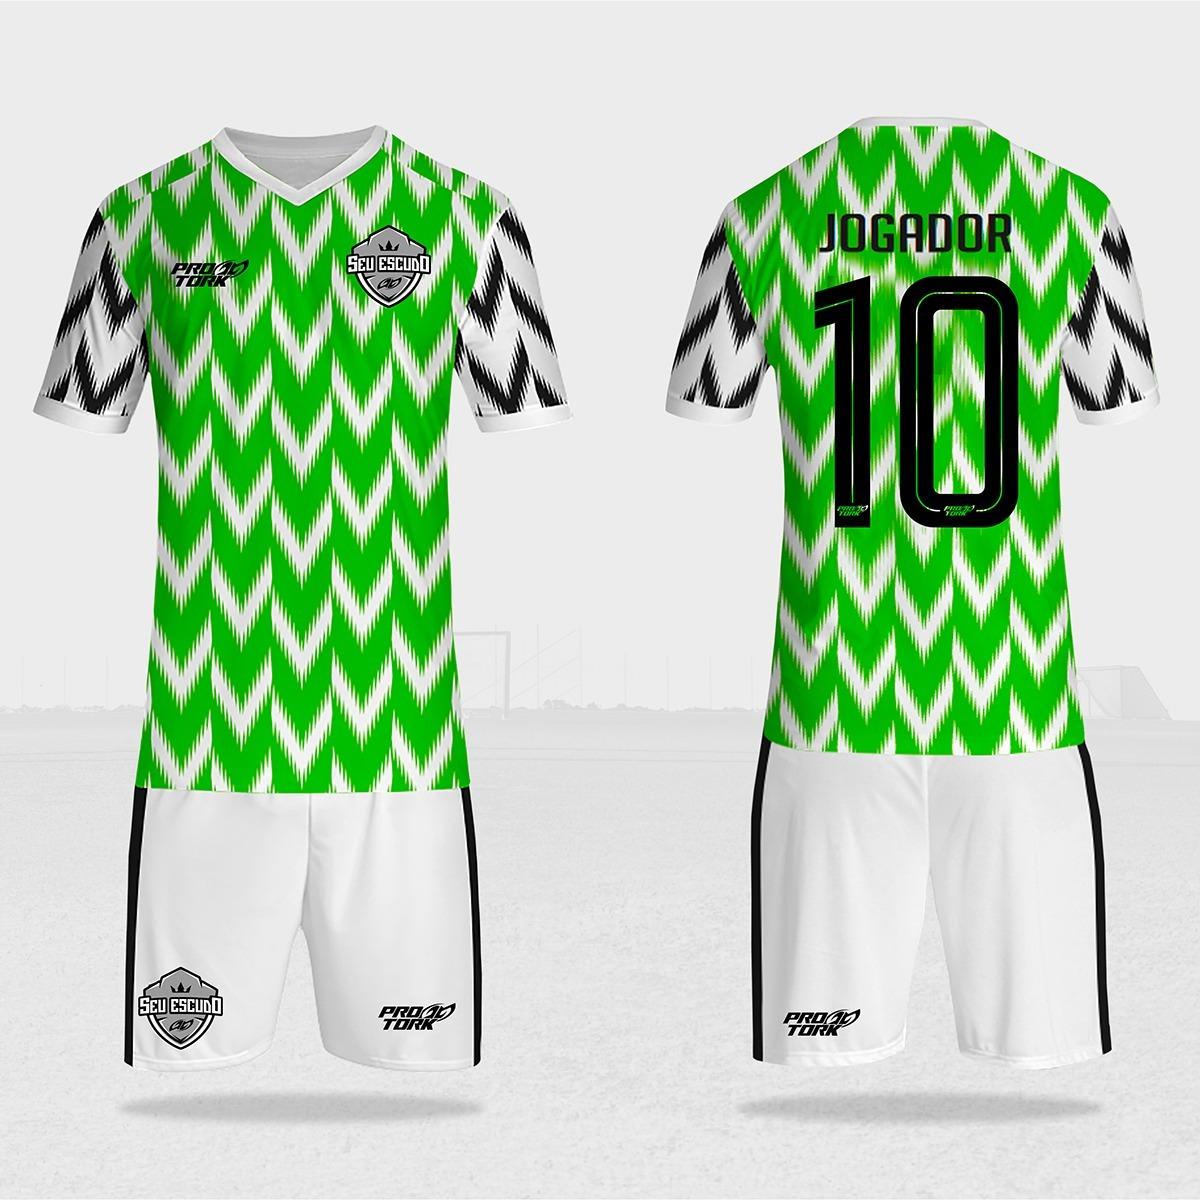 8f89c3df8 camisa de time personalizada 10un futebol ou futsal. Carregando zoom.